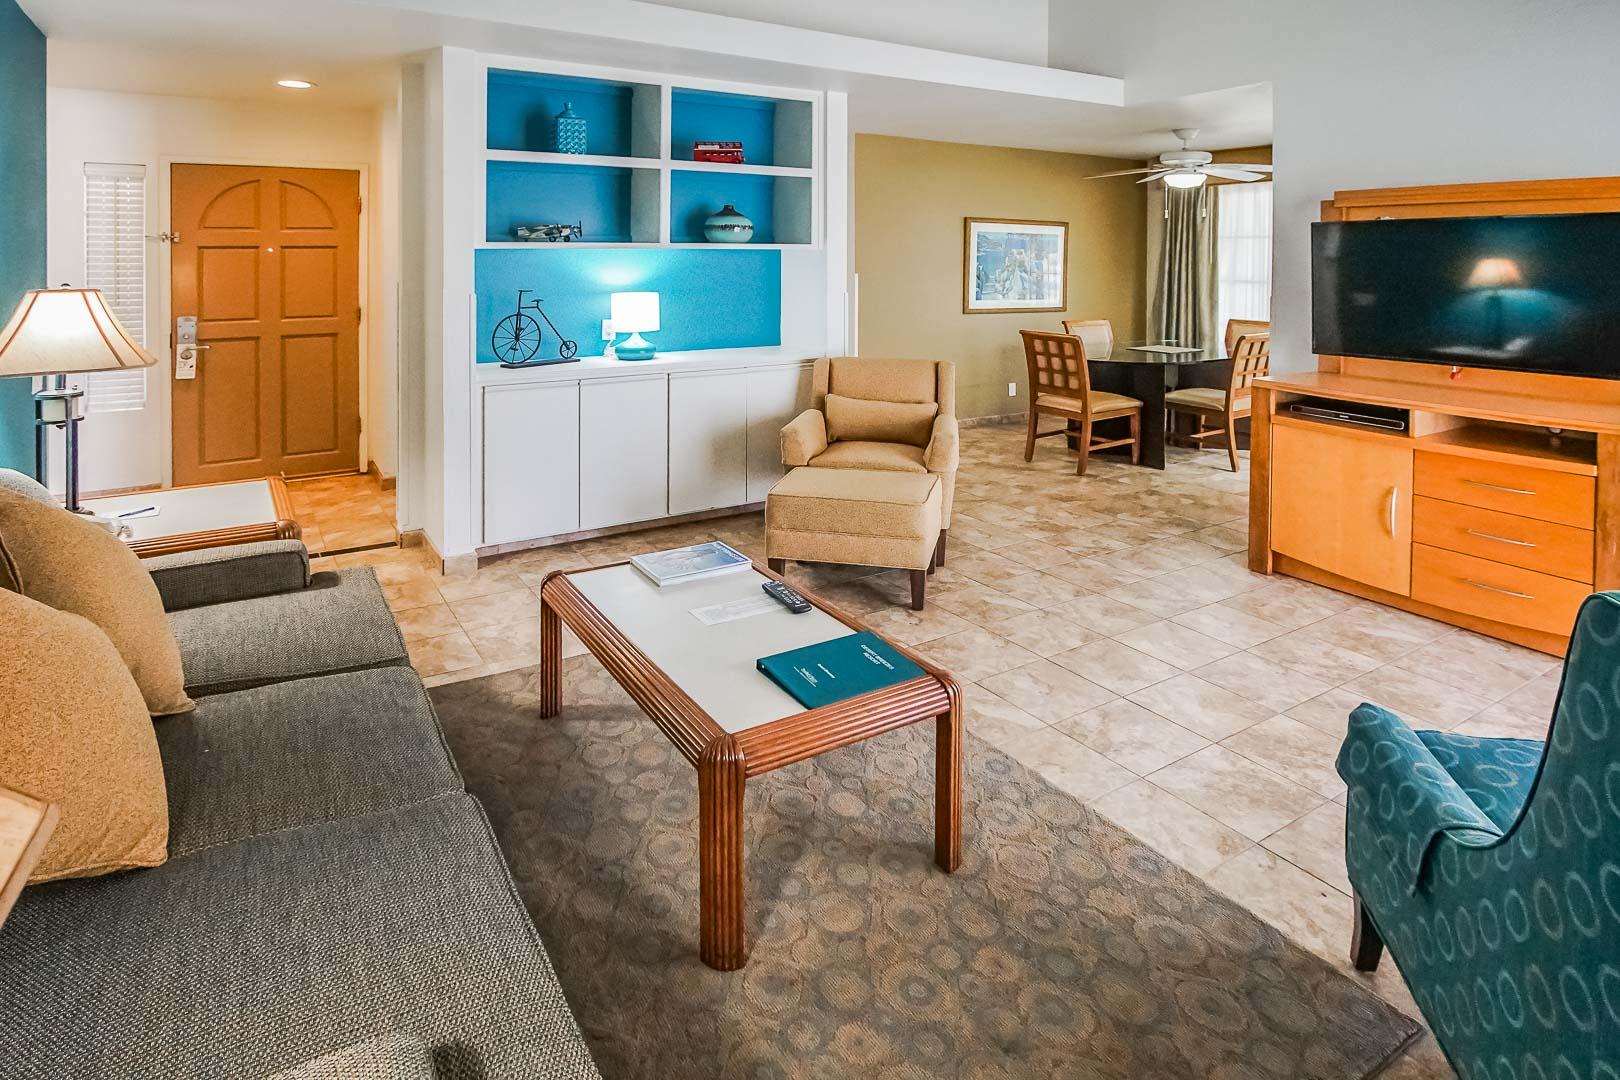 A charming living room at VRI Americas' Desert Breezes resort in California